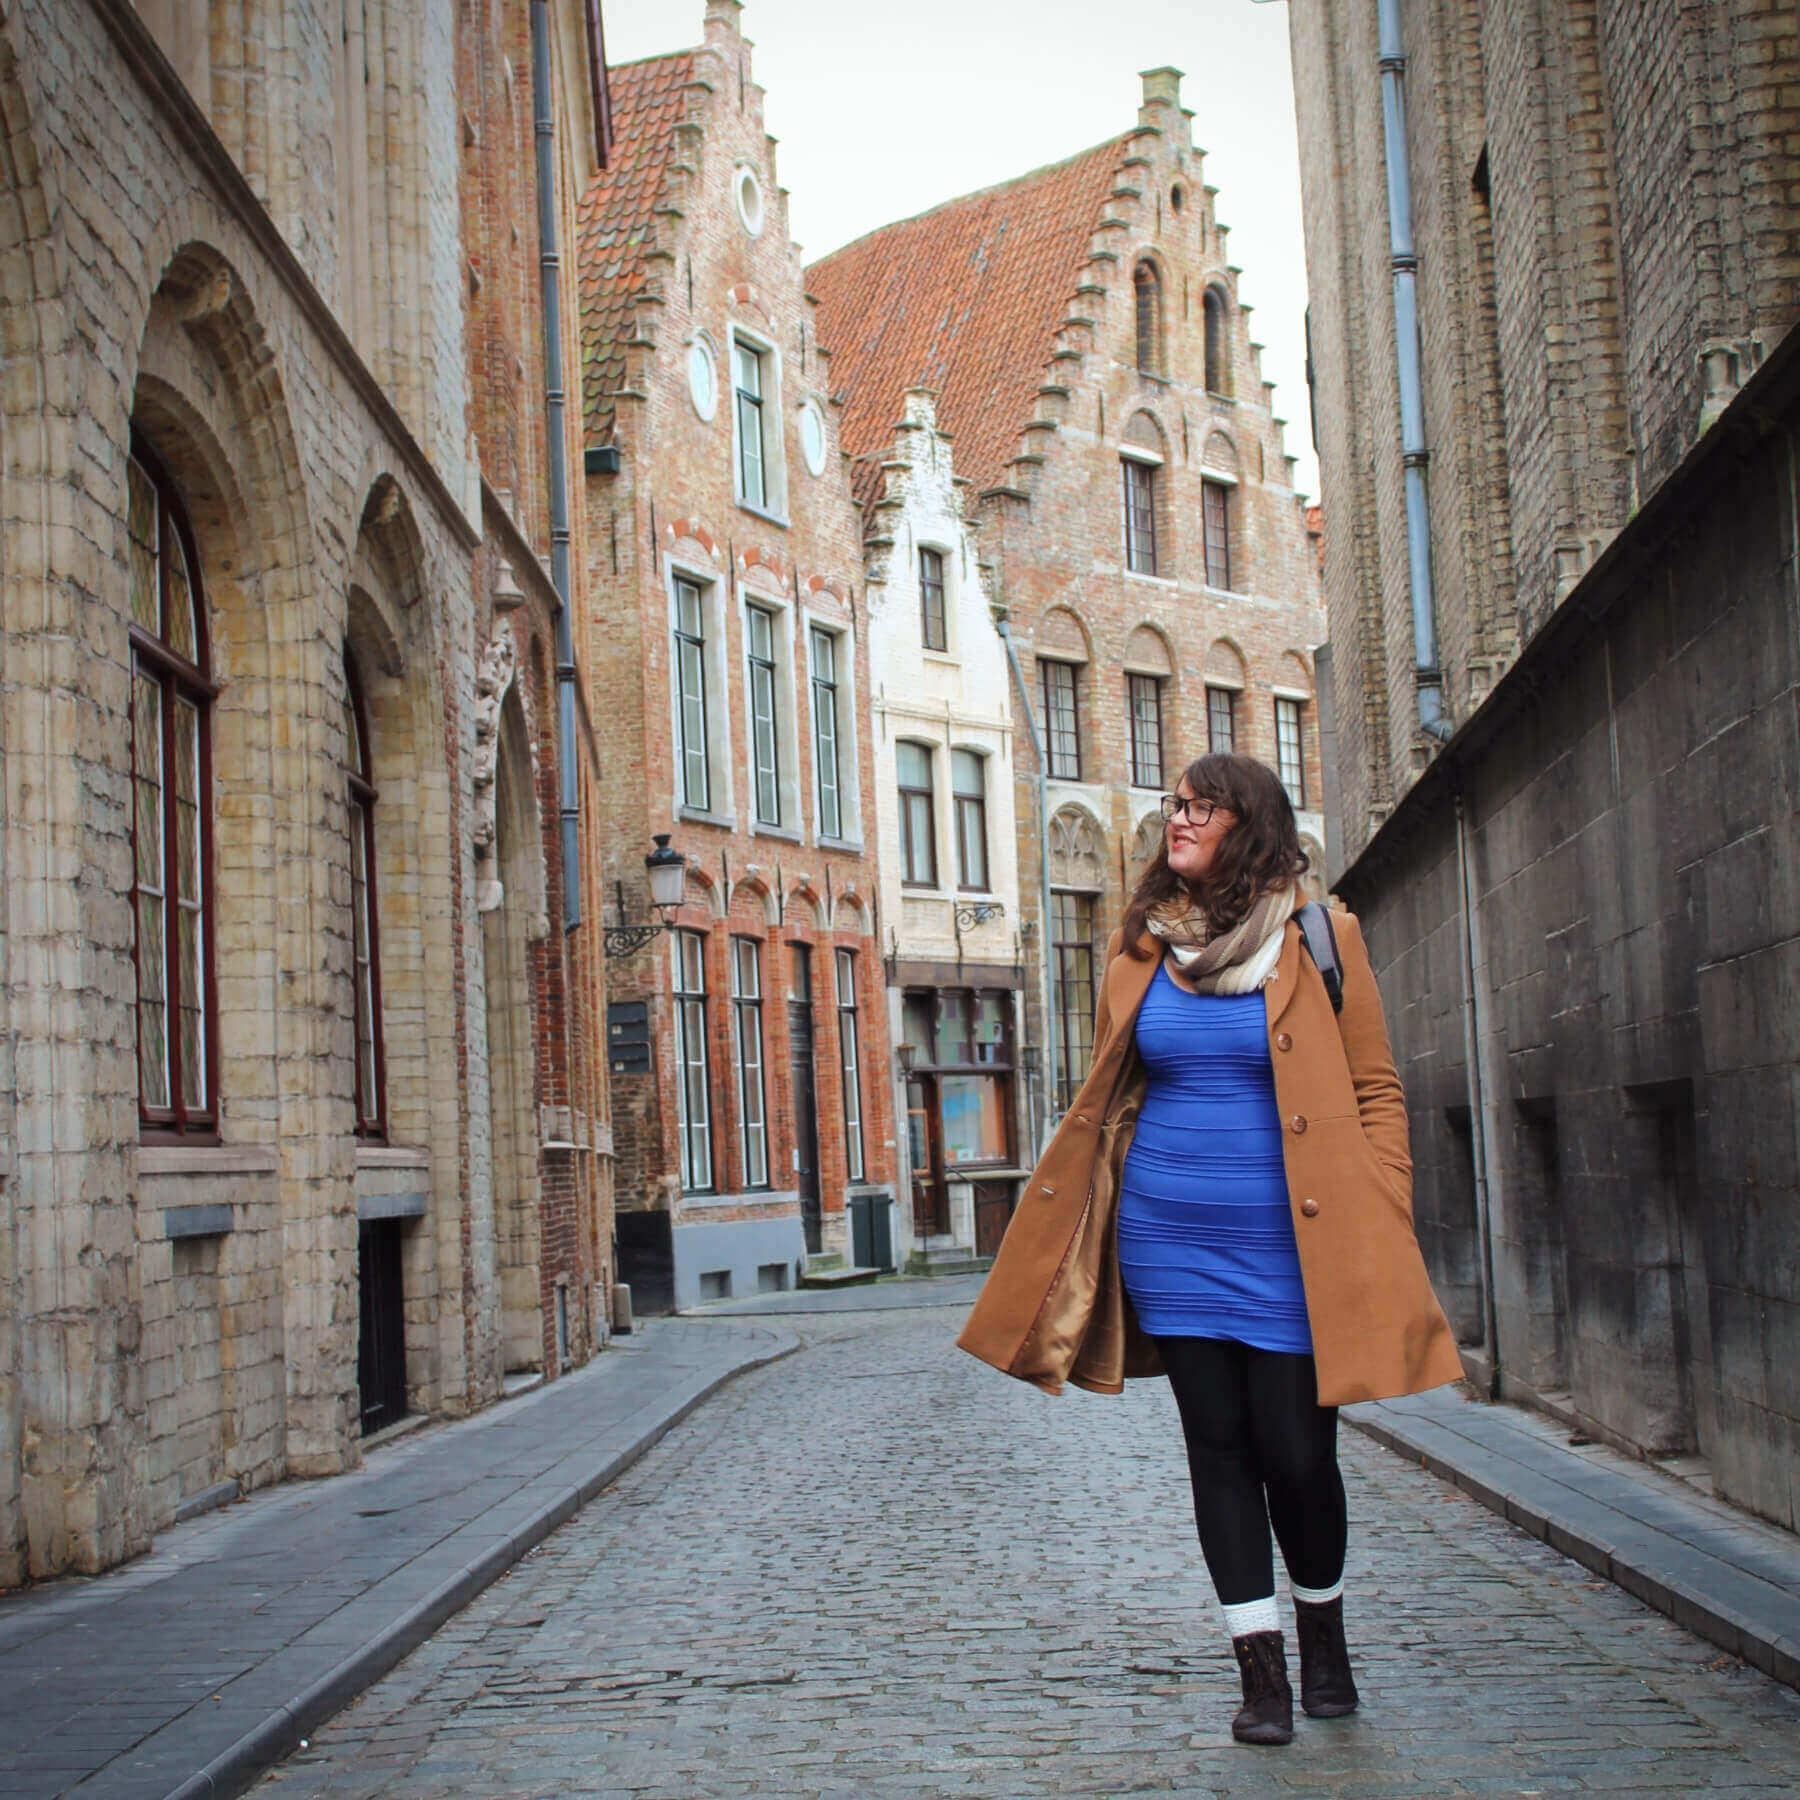 Wandering the streets of Brugges, Belgium.